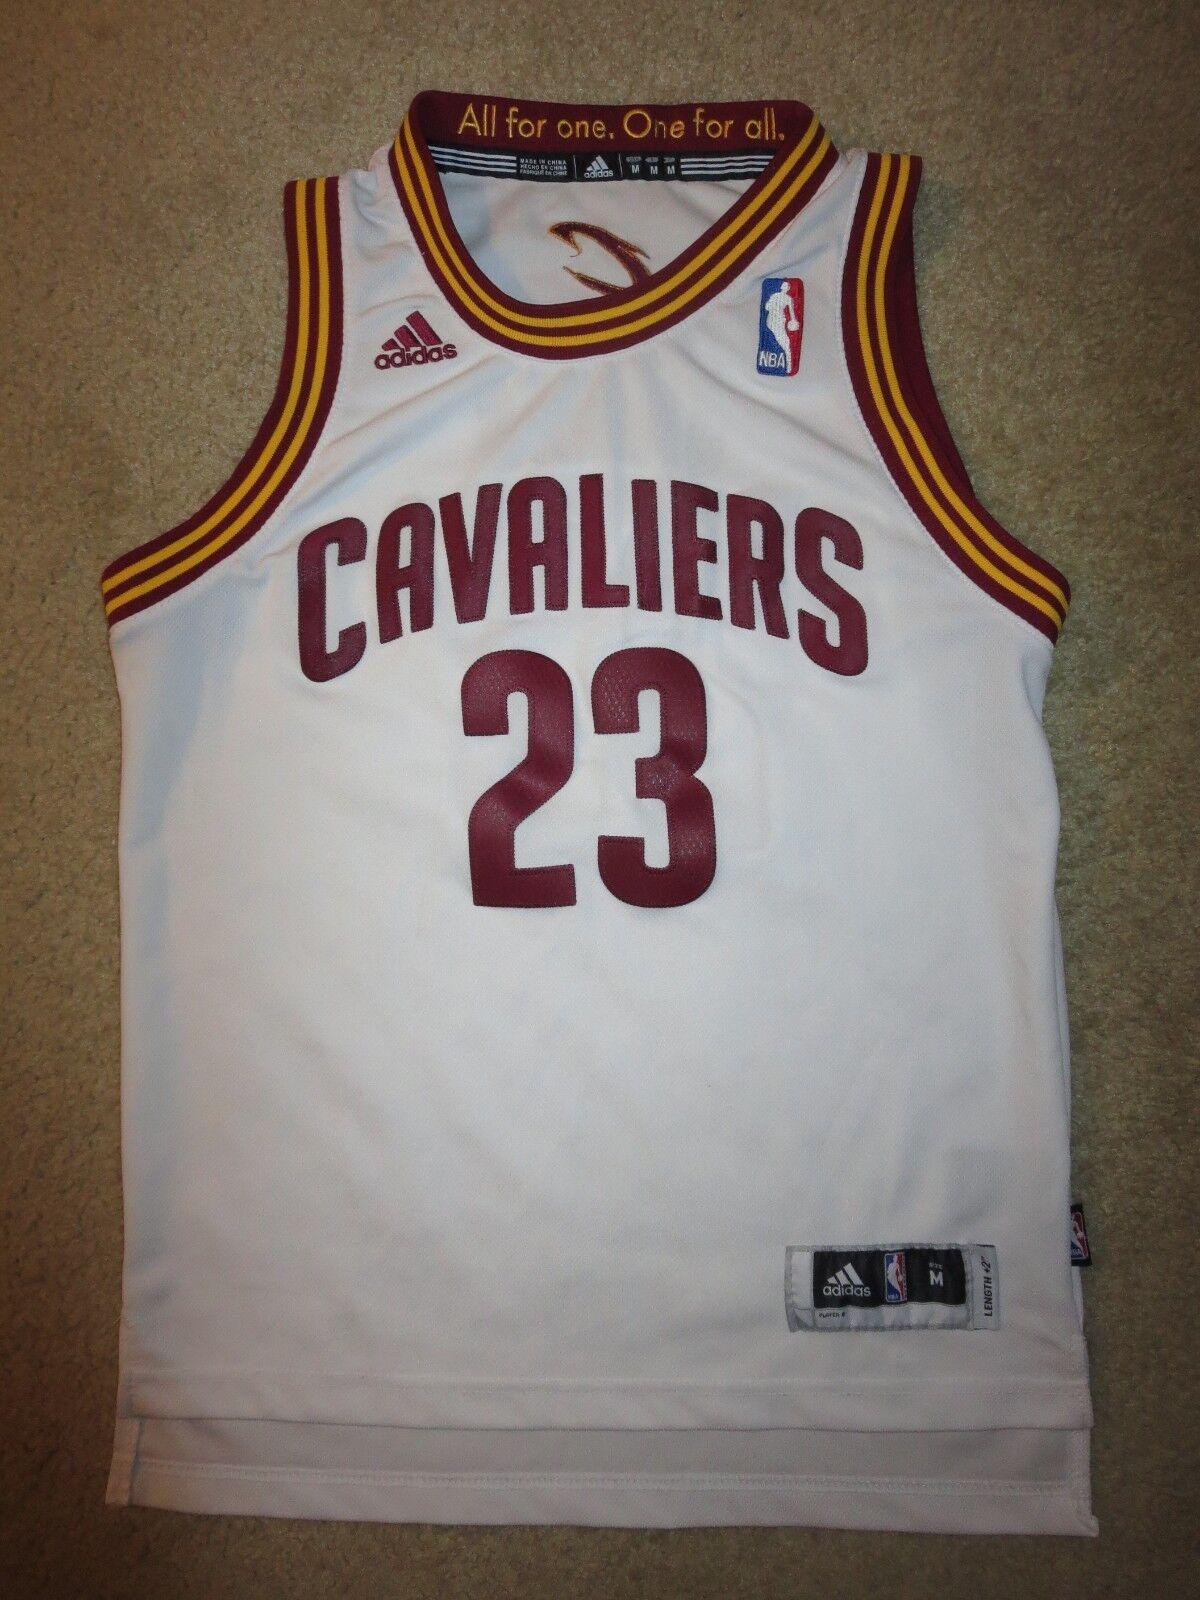 4baa84d674e Lebron James 23 23 23 Cleveland Kavaliere Adidas NBA Finale Trikot  Jugendliche M